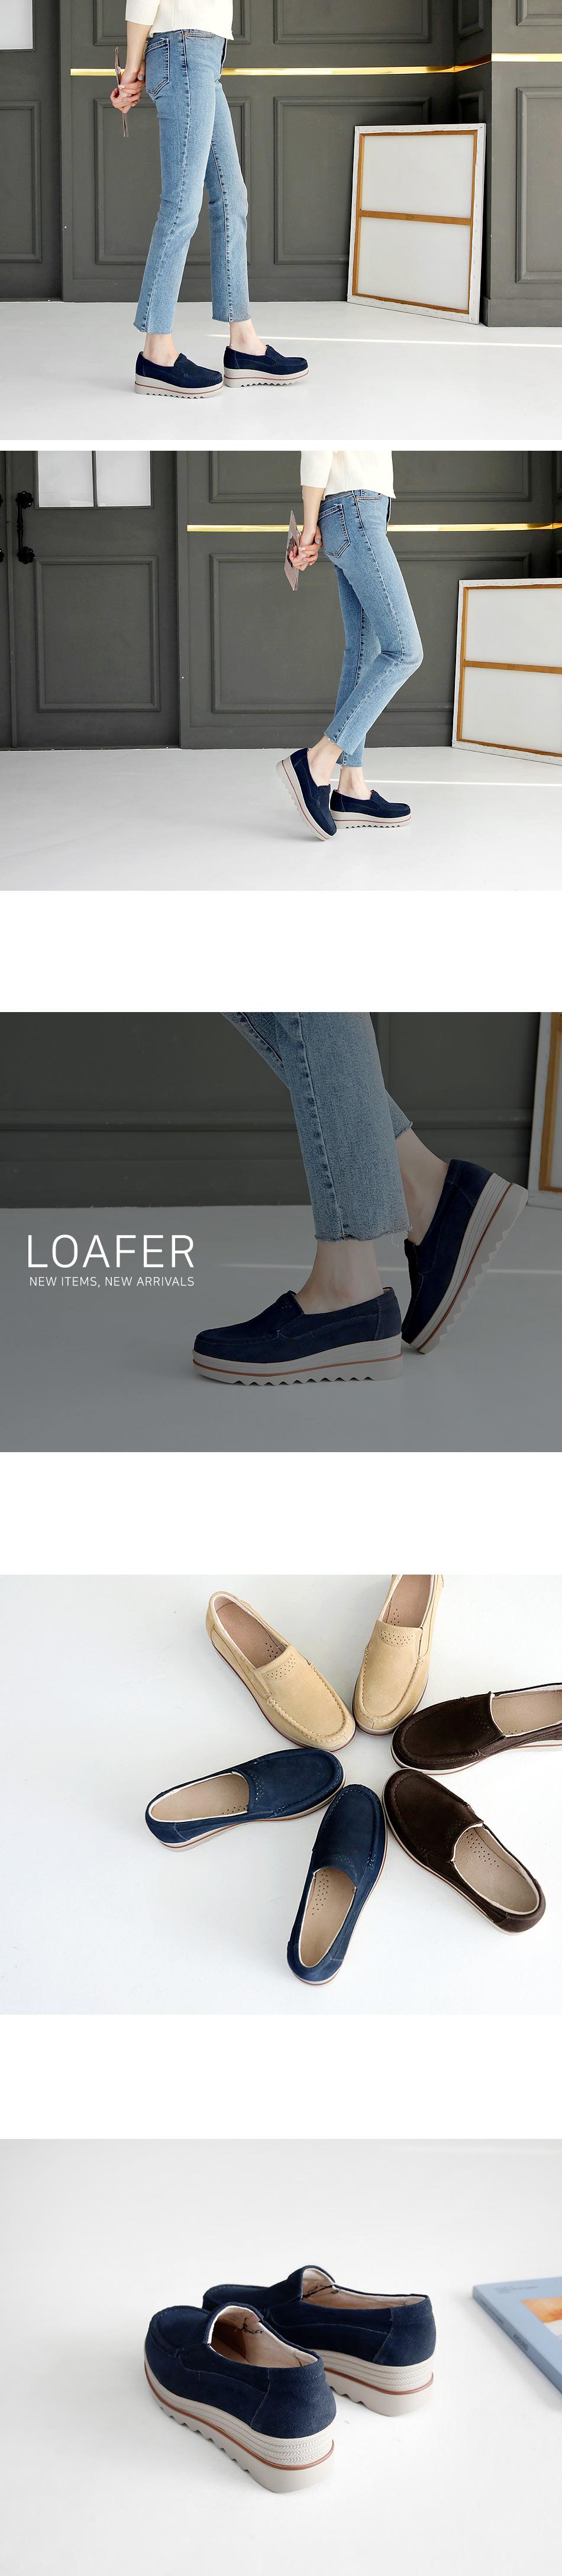 I like wedge full heel loafers 5cm